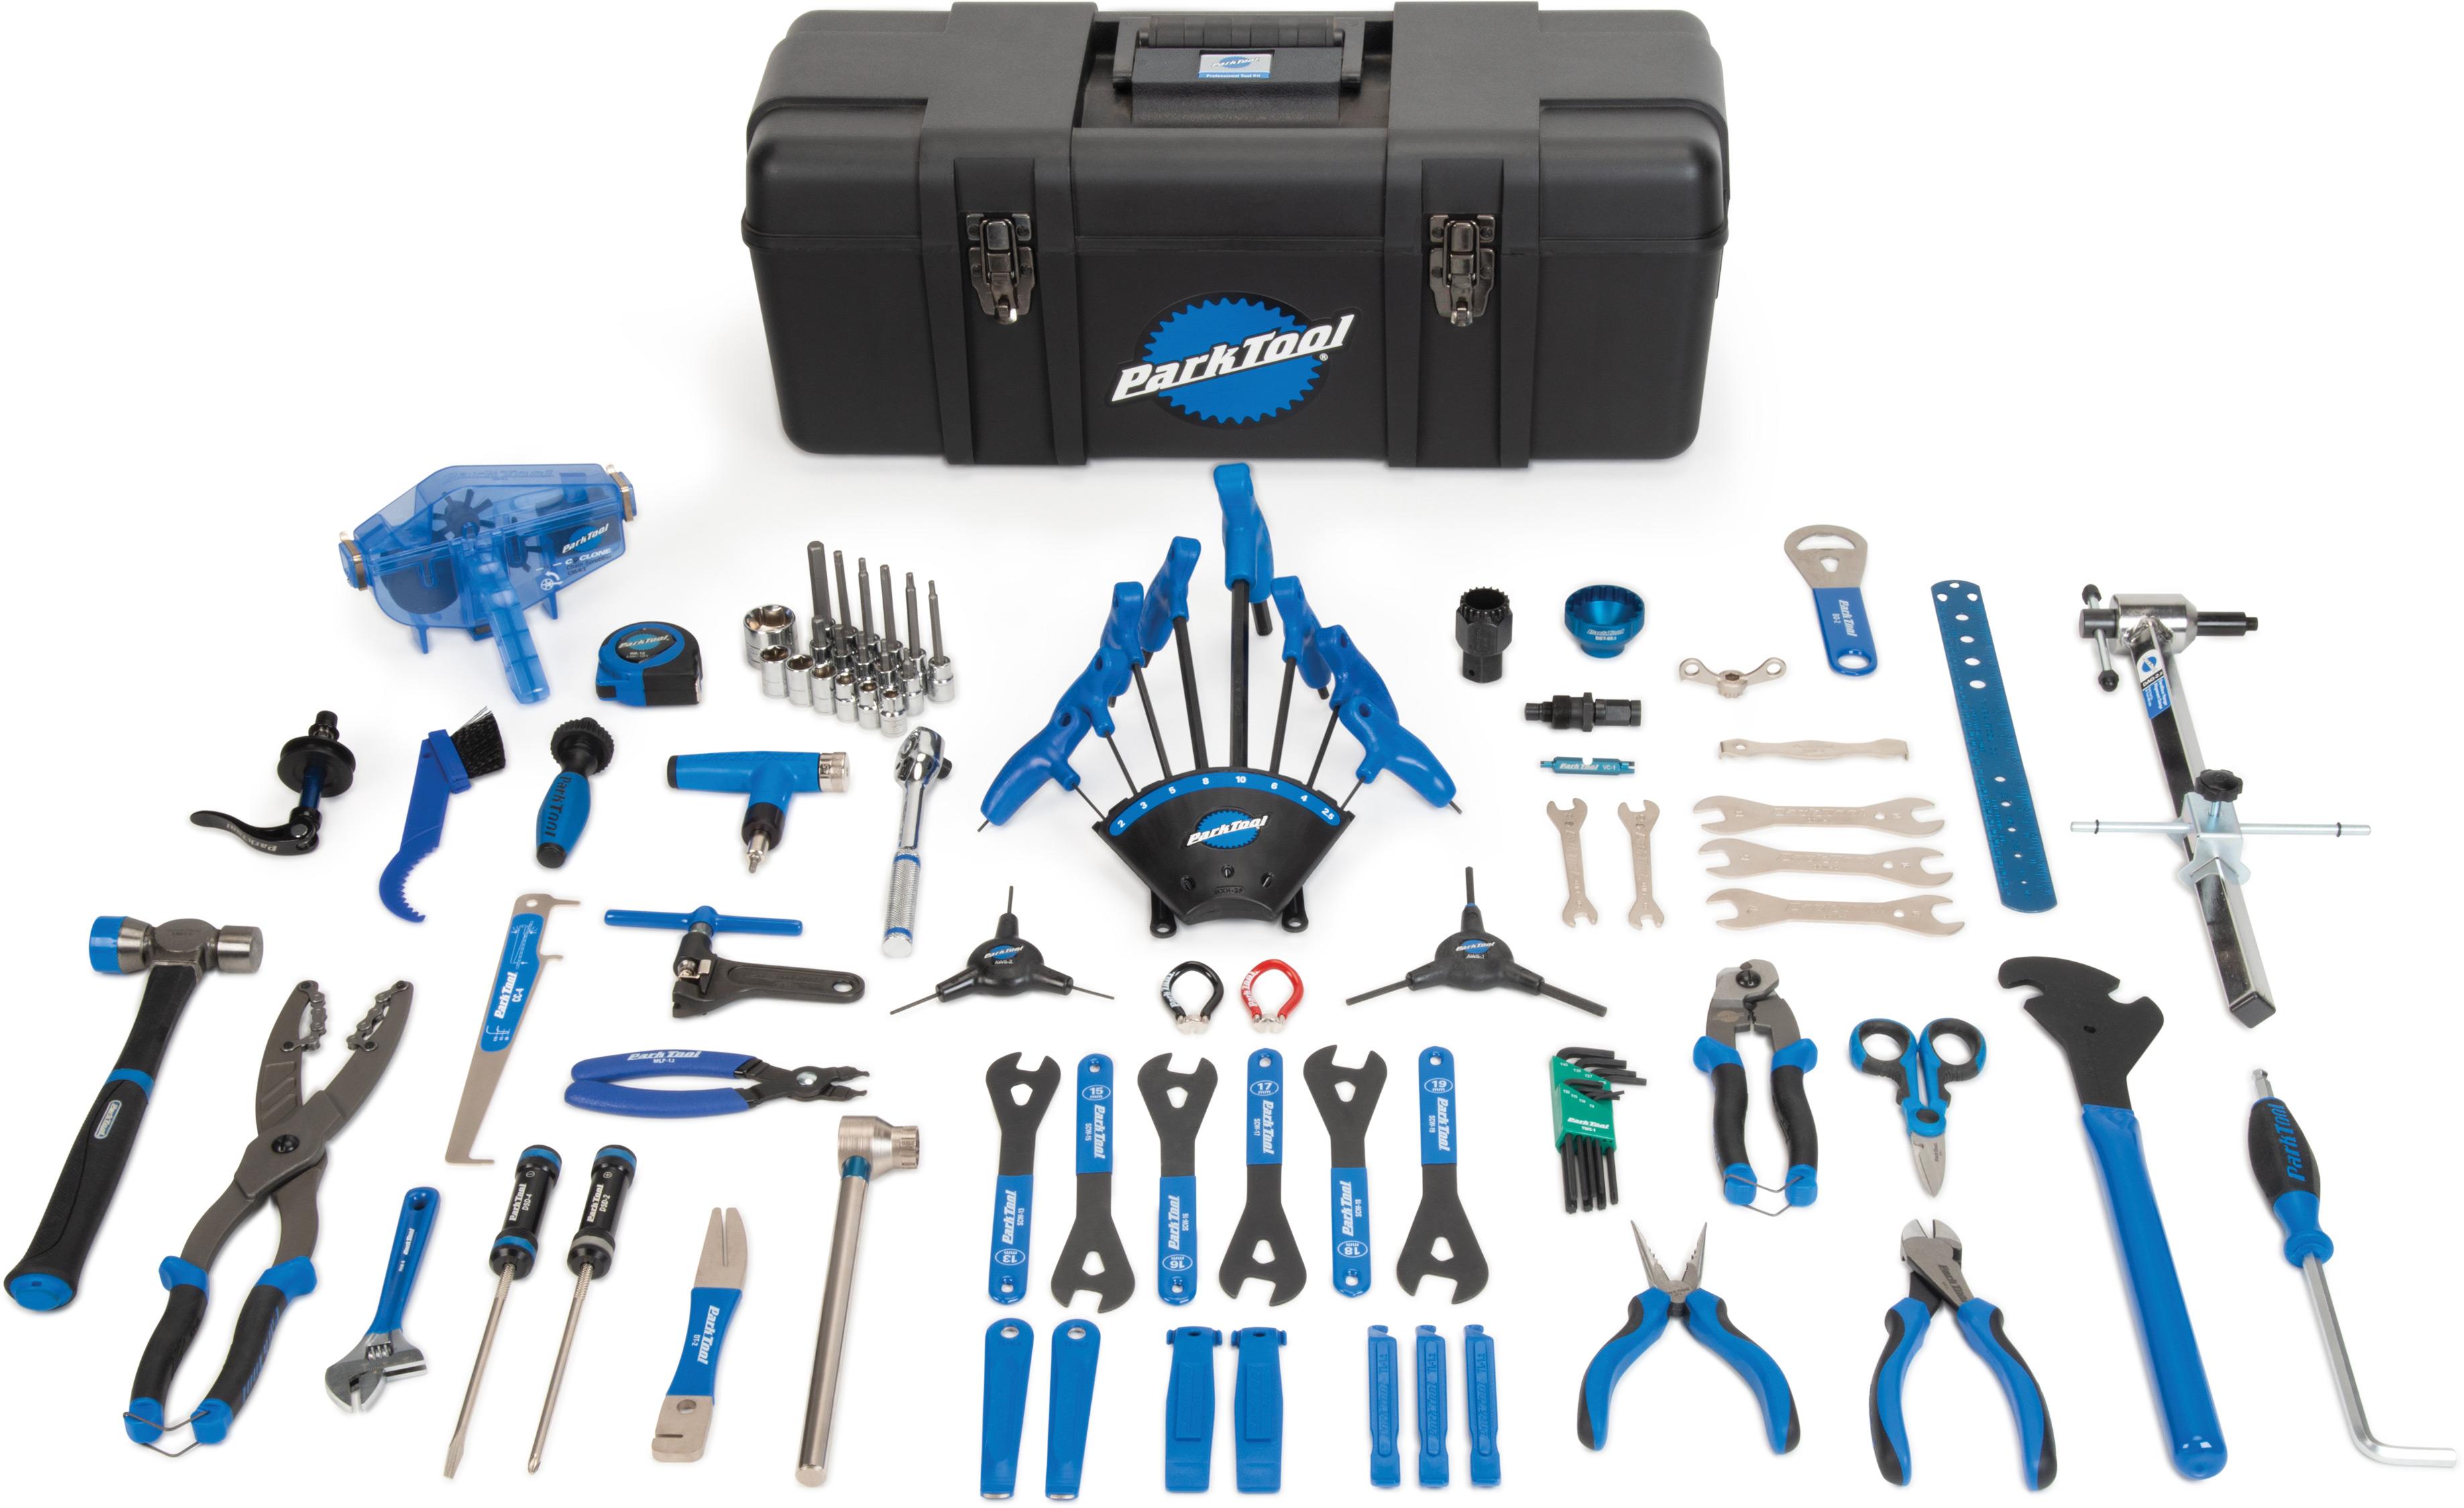 Bicycle Shop Mechanic/'s Tool Crank Puller Park Cwp-7 Bike Repair//Service